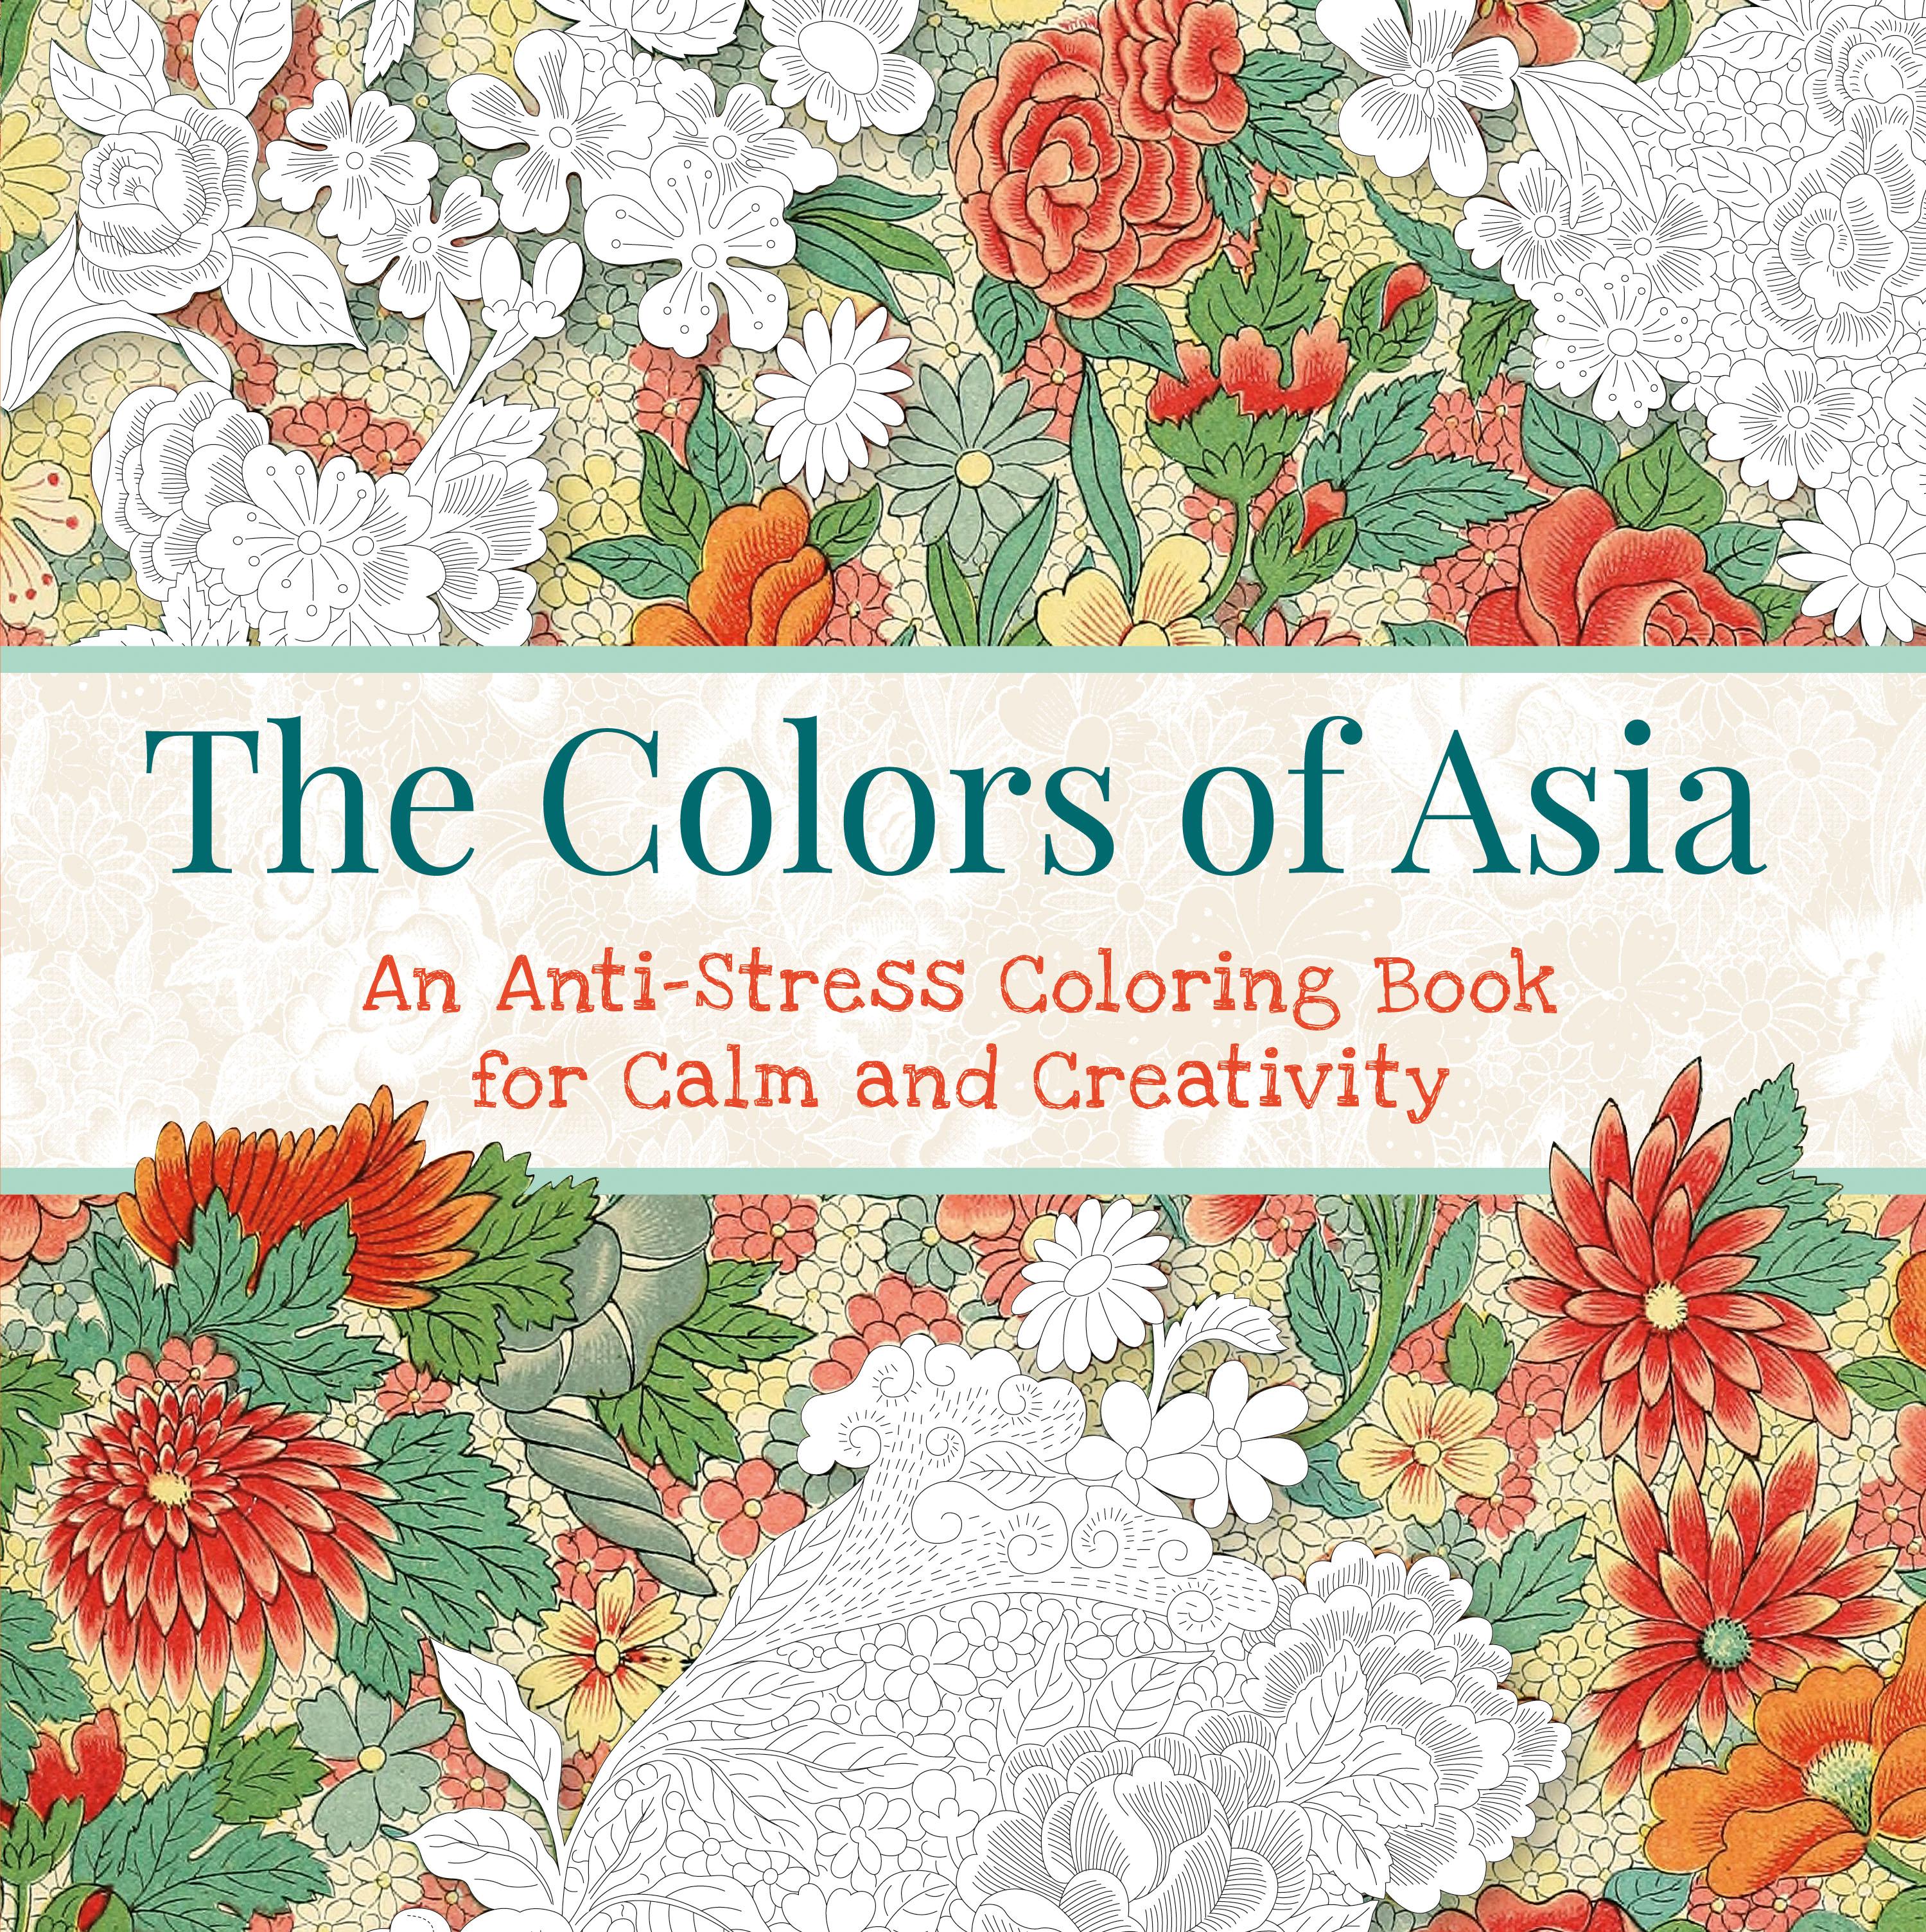 Creative anti stress colouring book - Full Size Image